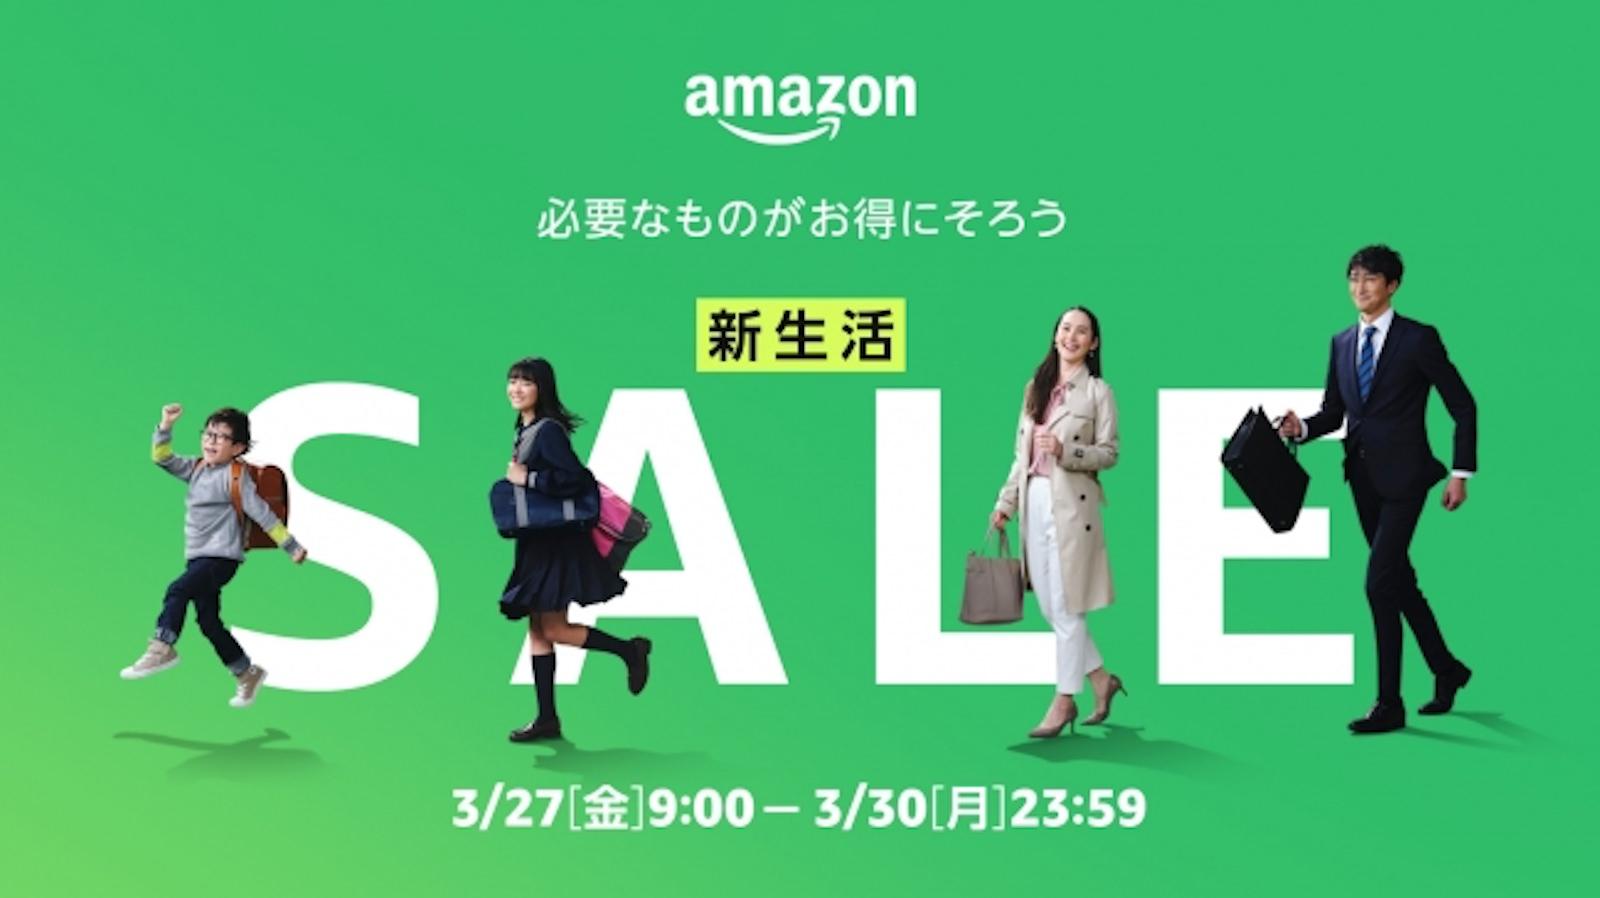 Amazon new life sale